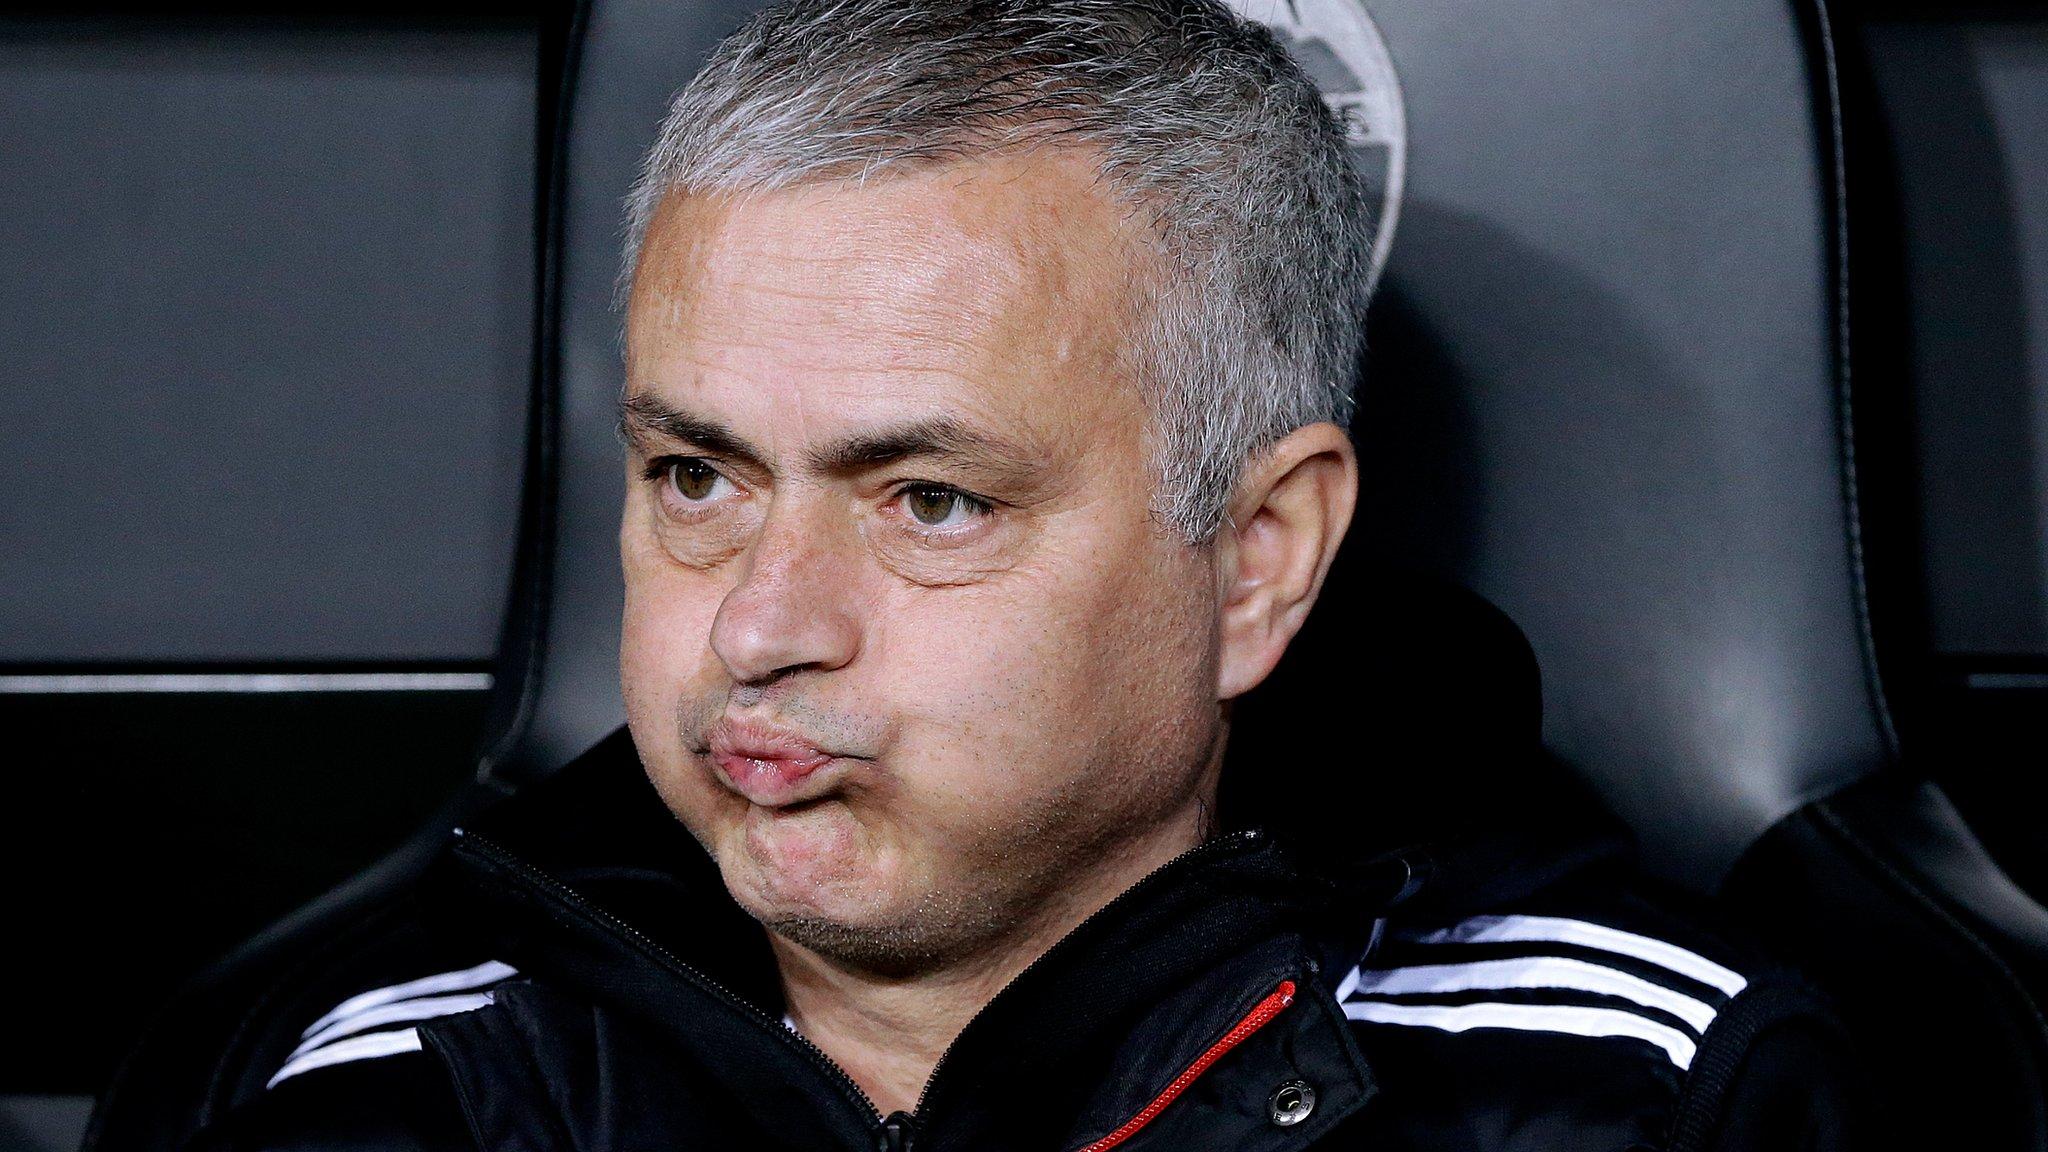 Champions League draw: Man City, Man Utd, Liverpool, Tottenham await last-16 ties